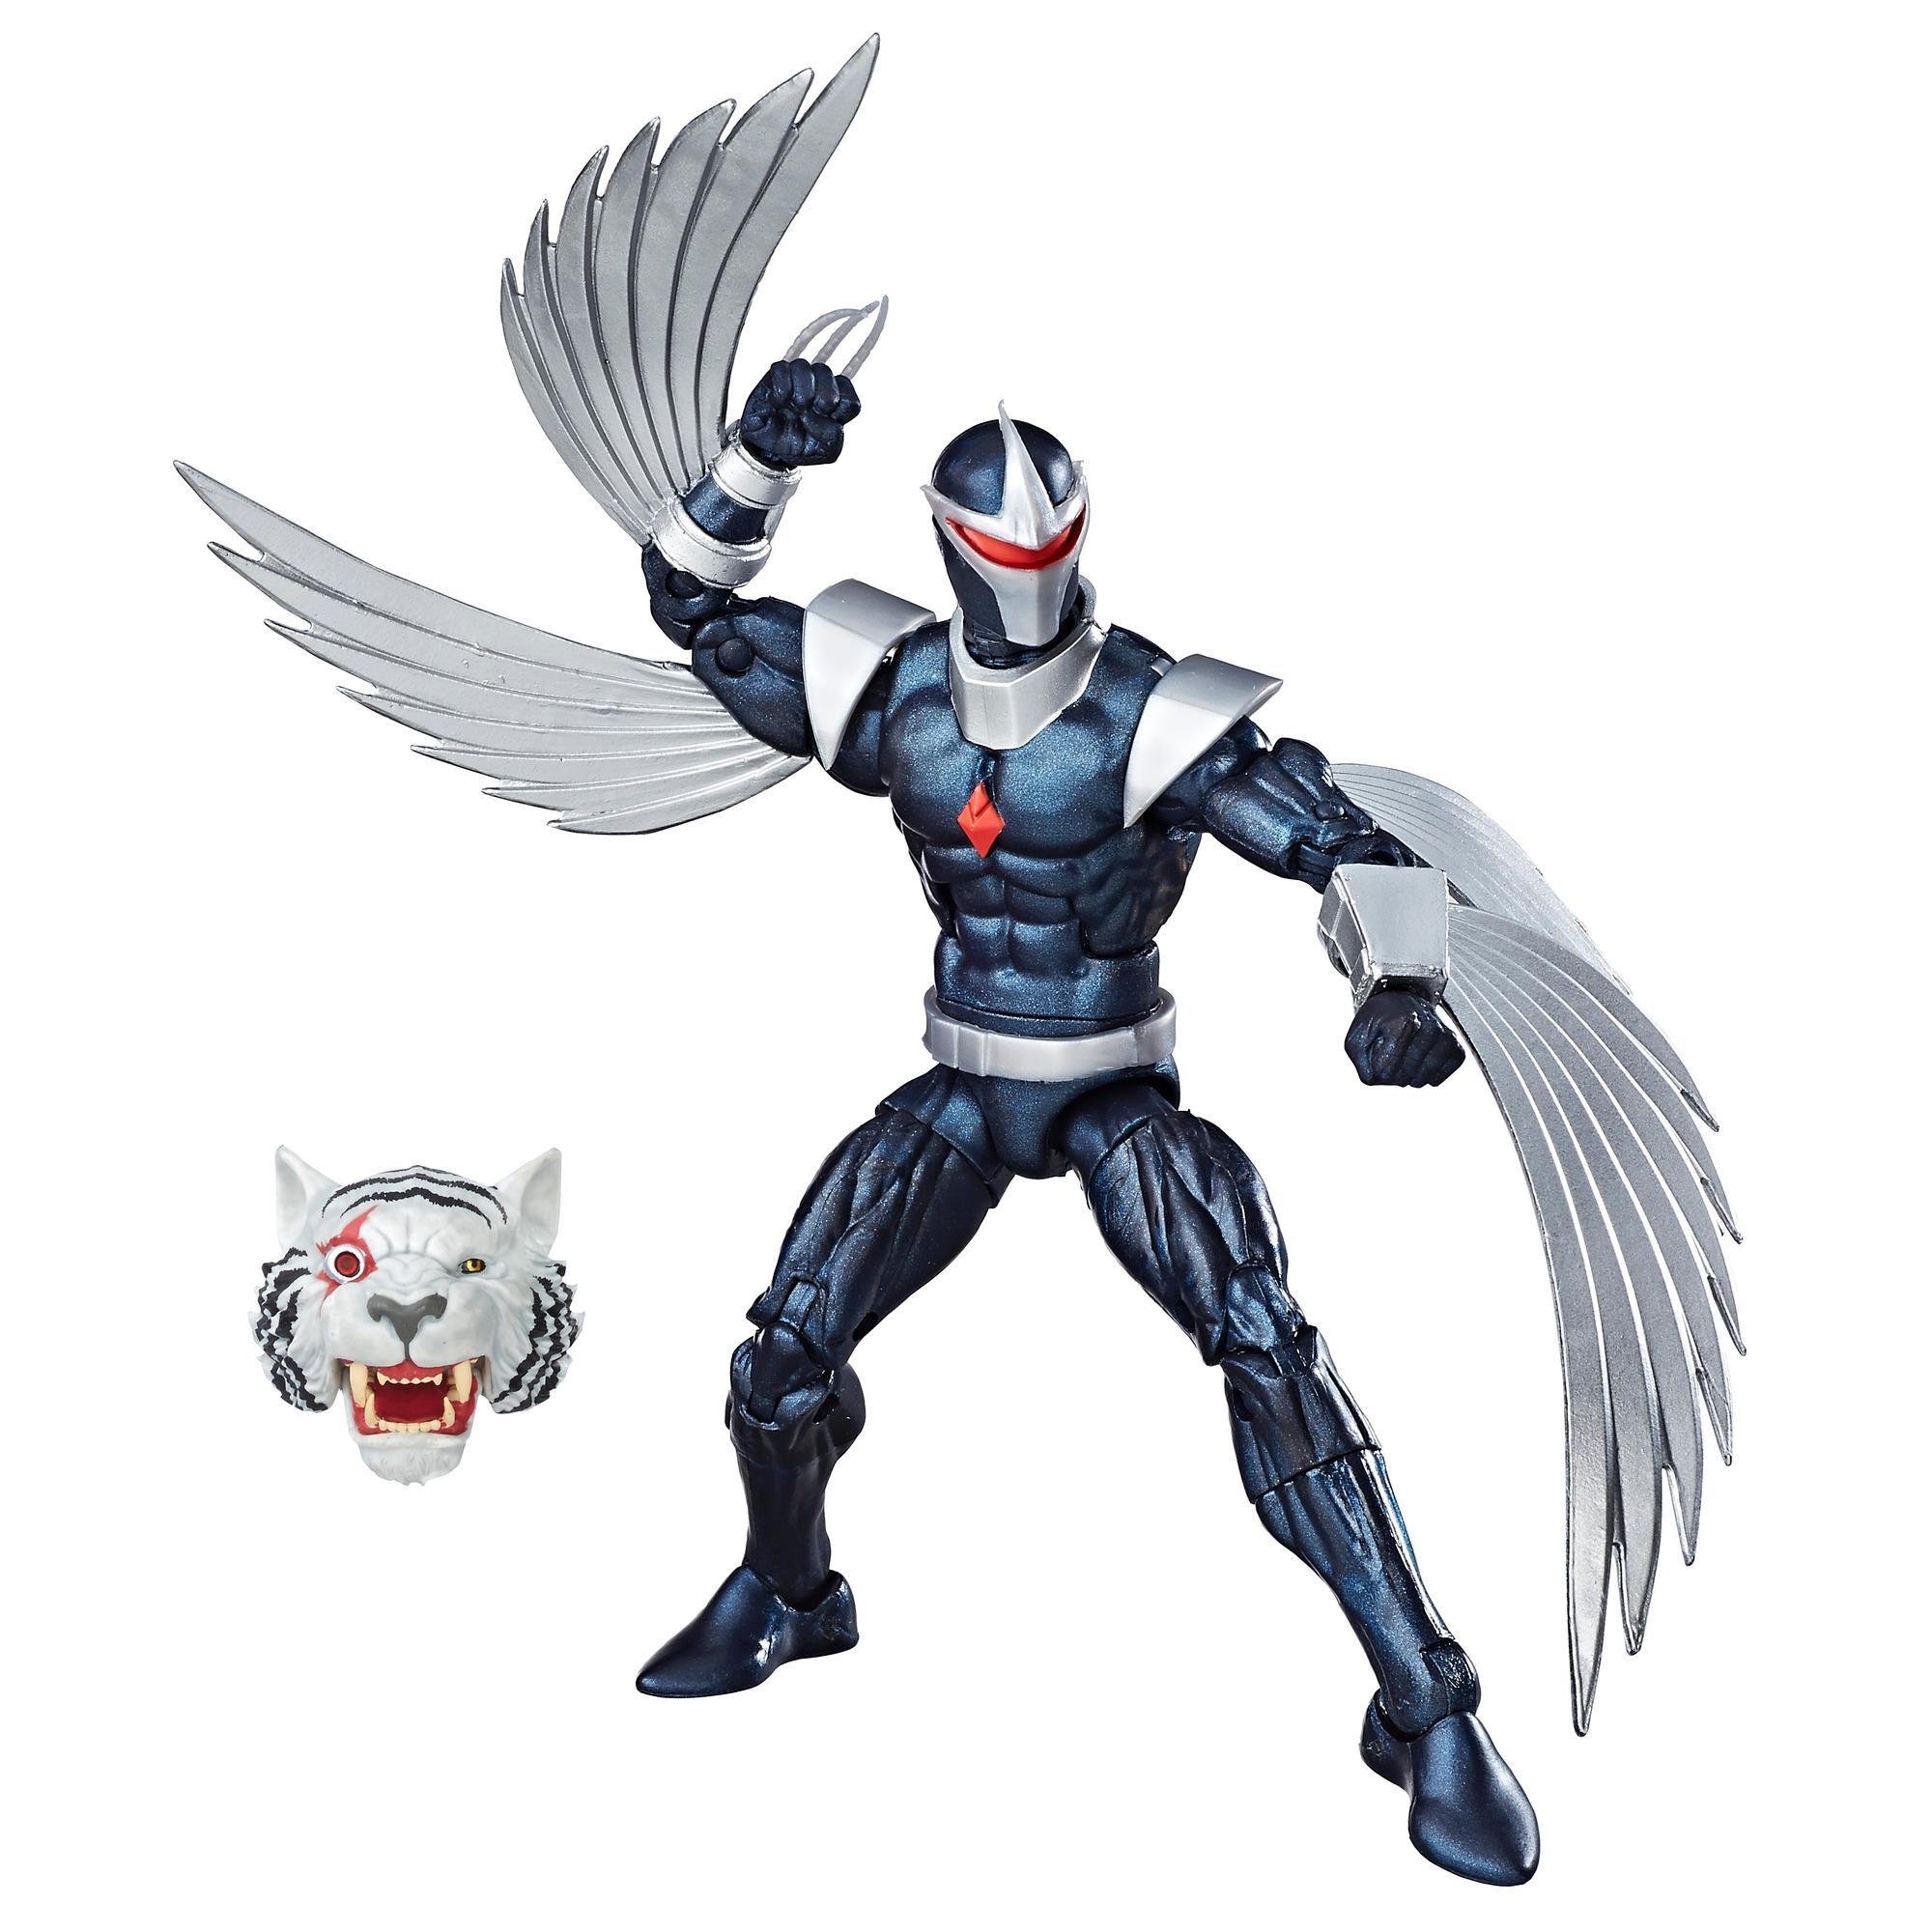 Marvel Guardians of the Galaxy Legends Series - Figurine Darkhawk de 15 cm